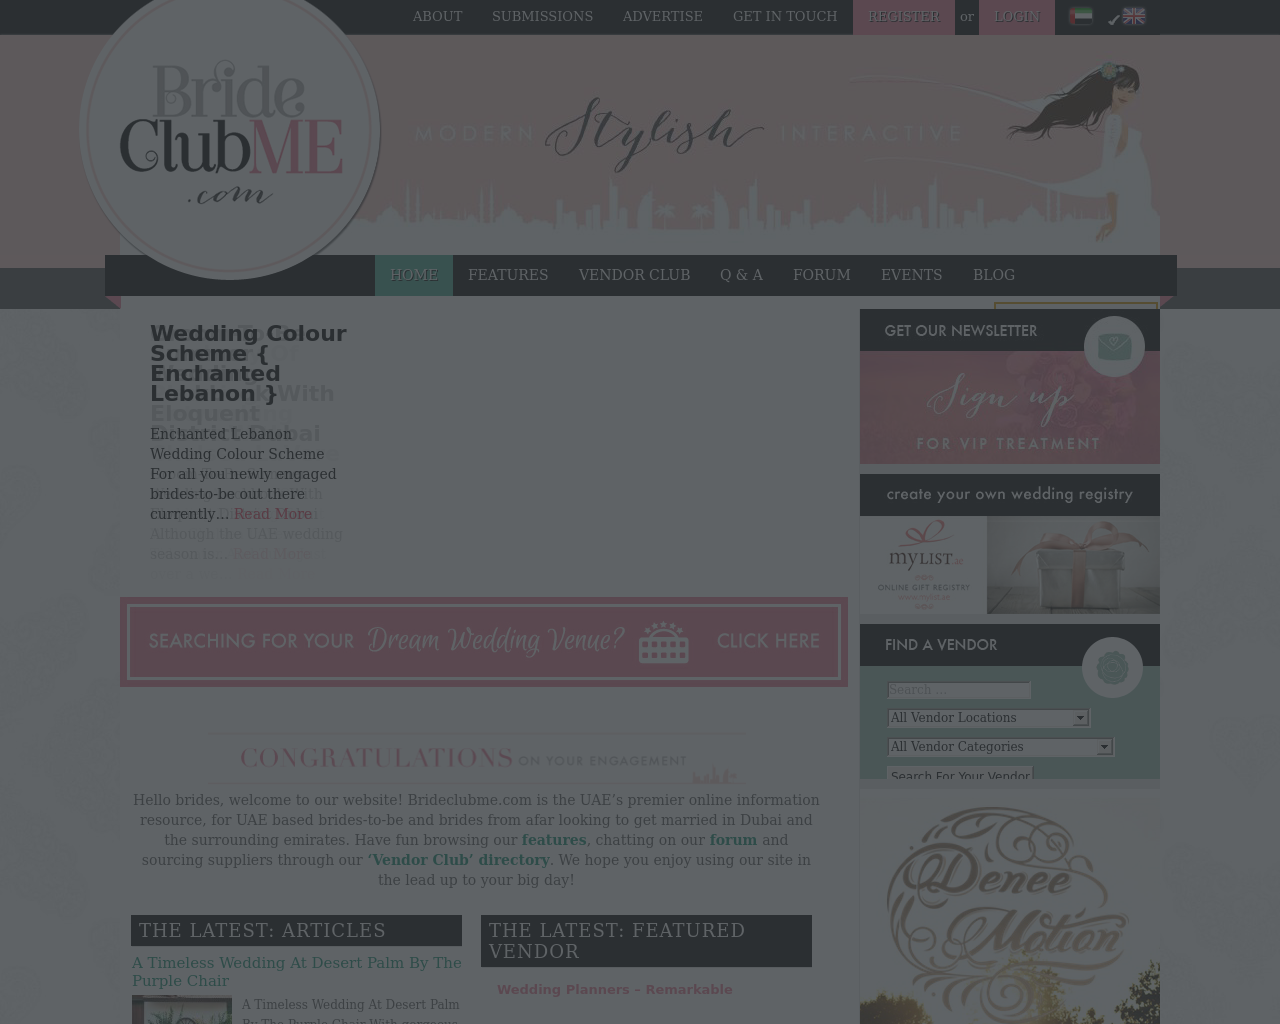 Bride-Club-Me-Advertising-Reviews-Pricing